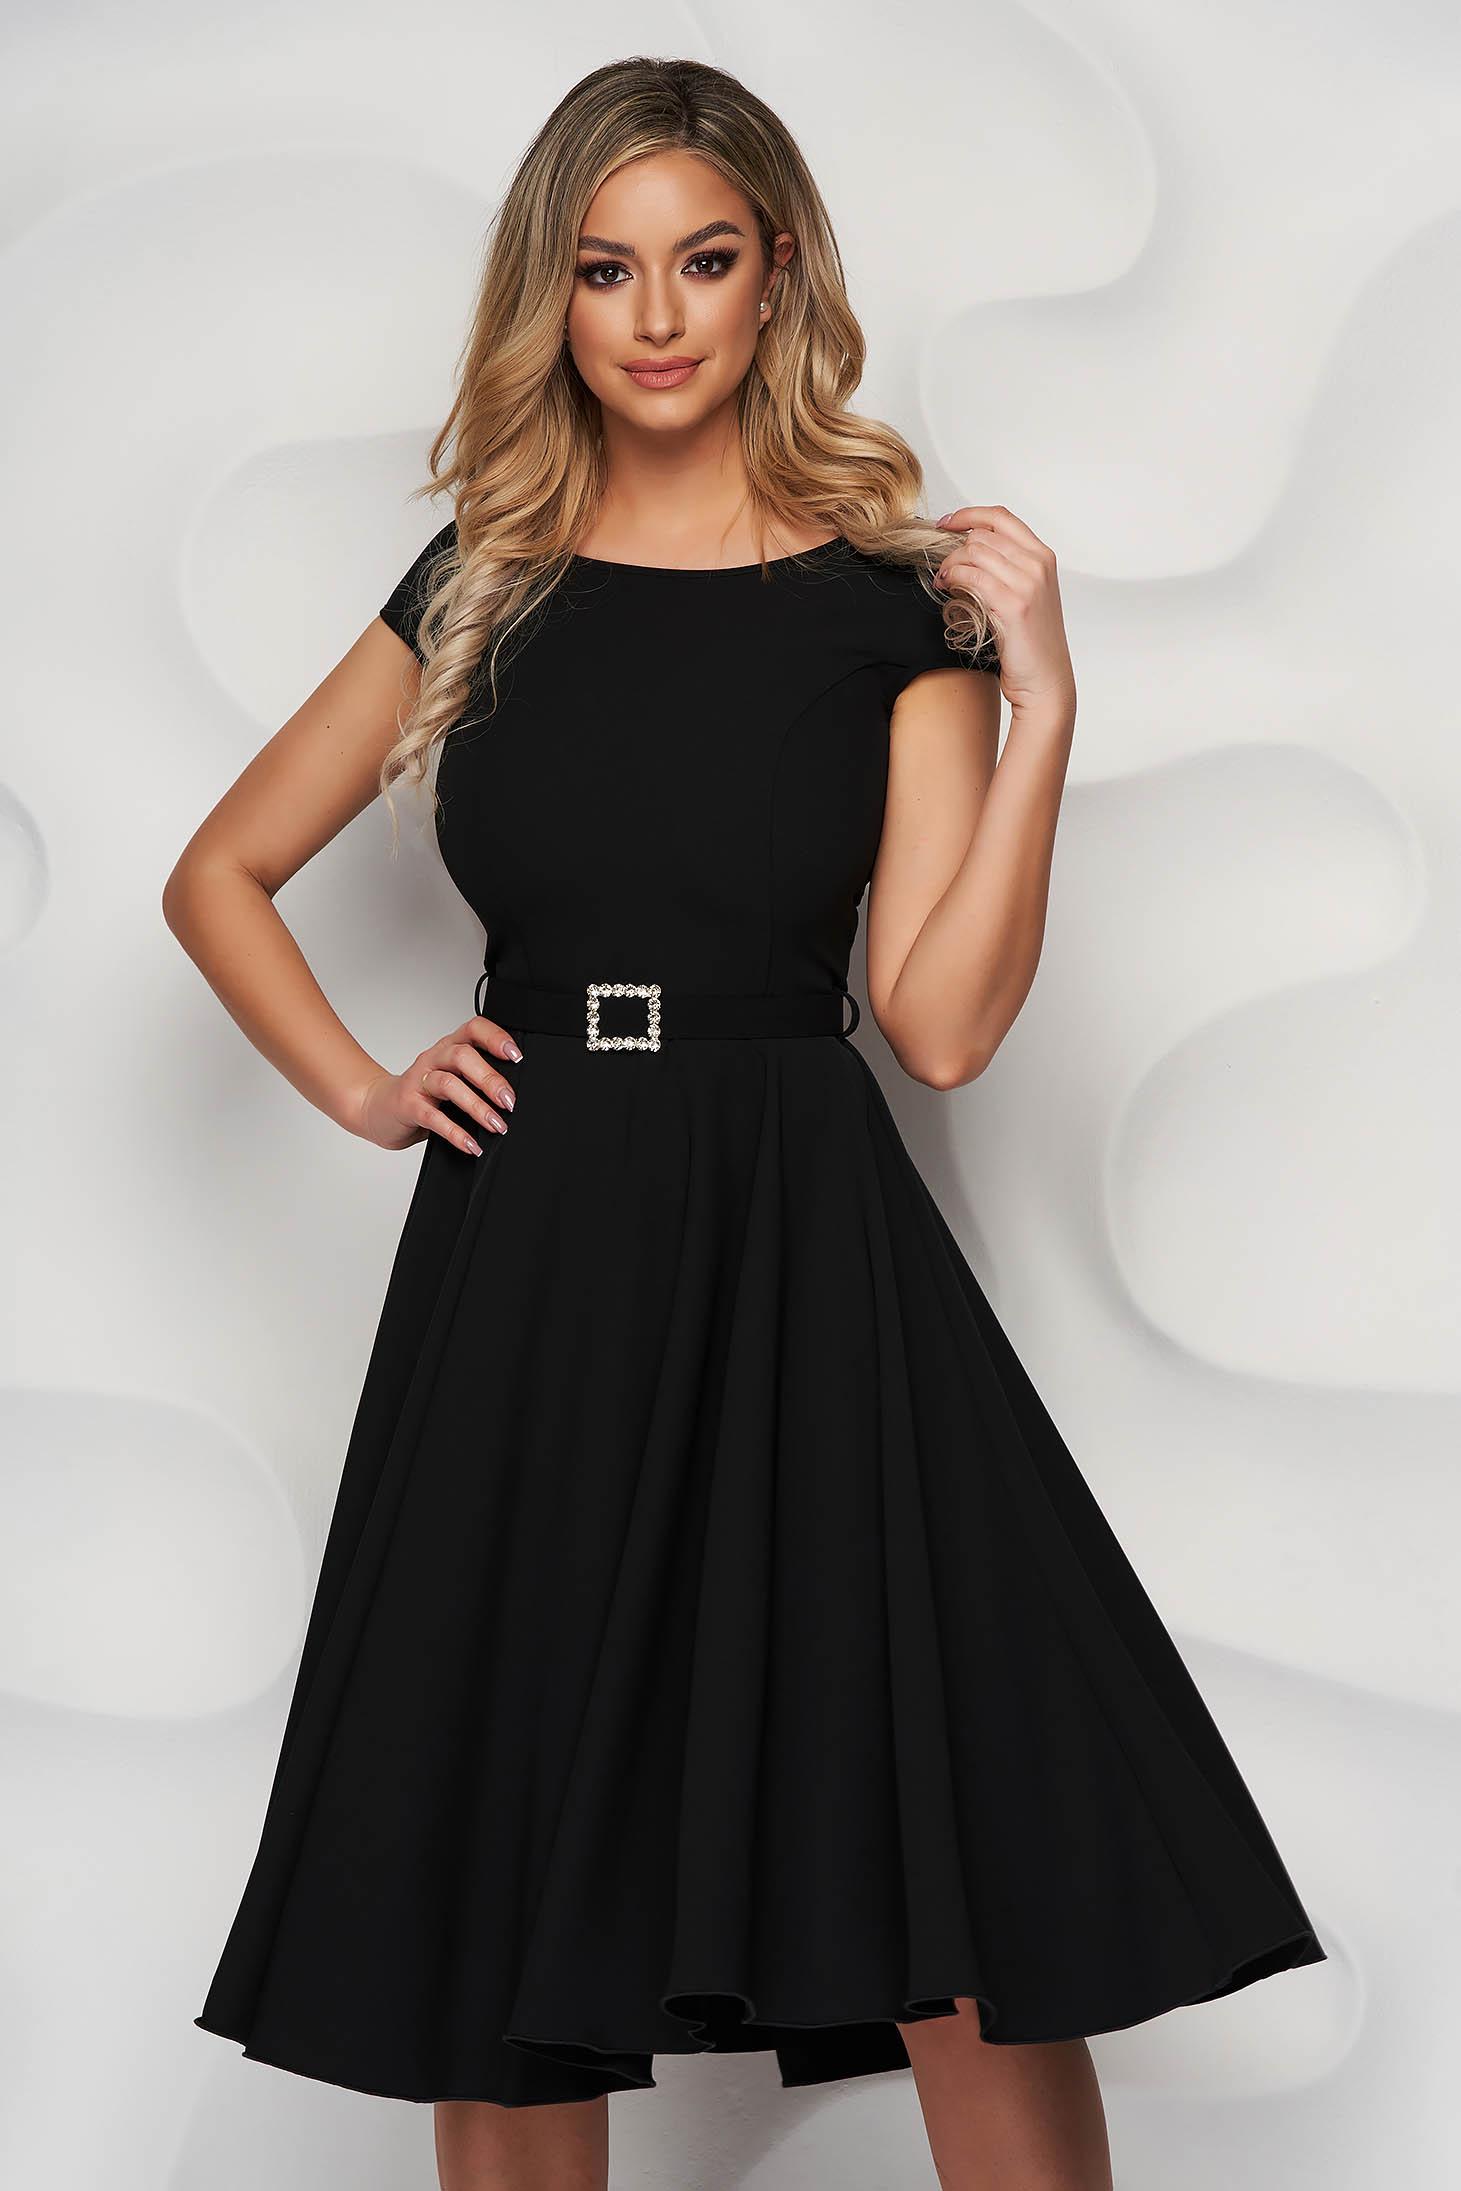 StarShinerS black dress elegant midi cloth accessorized with a waistband